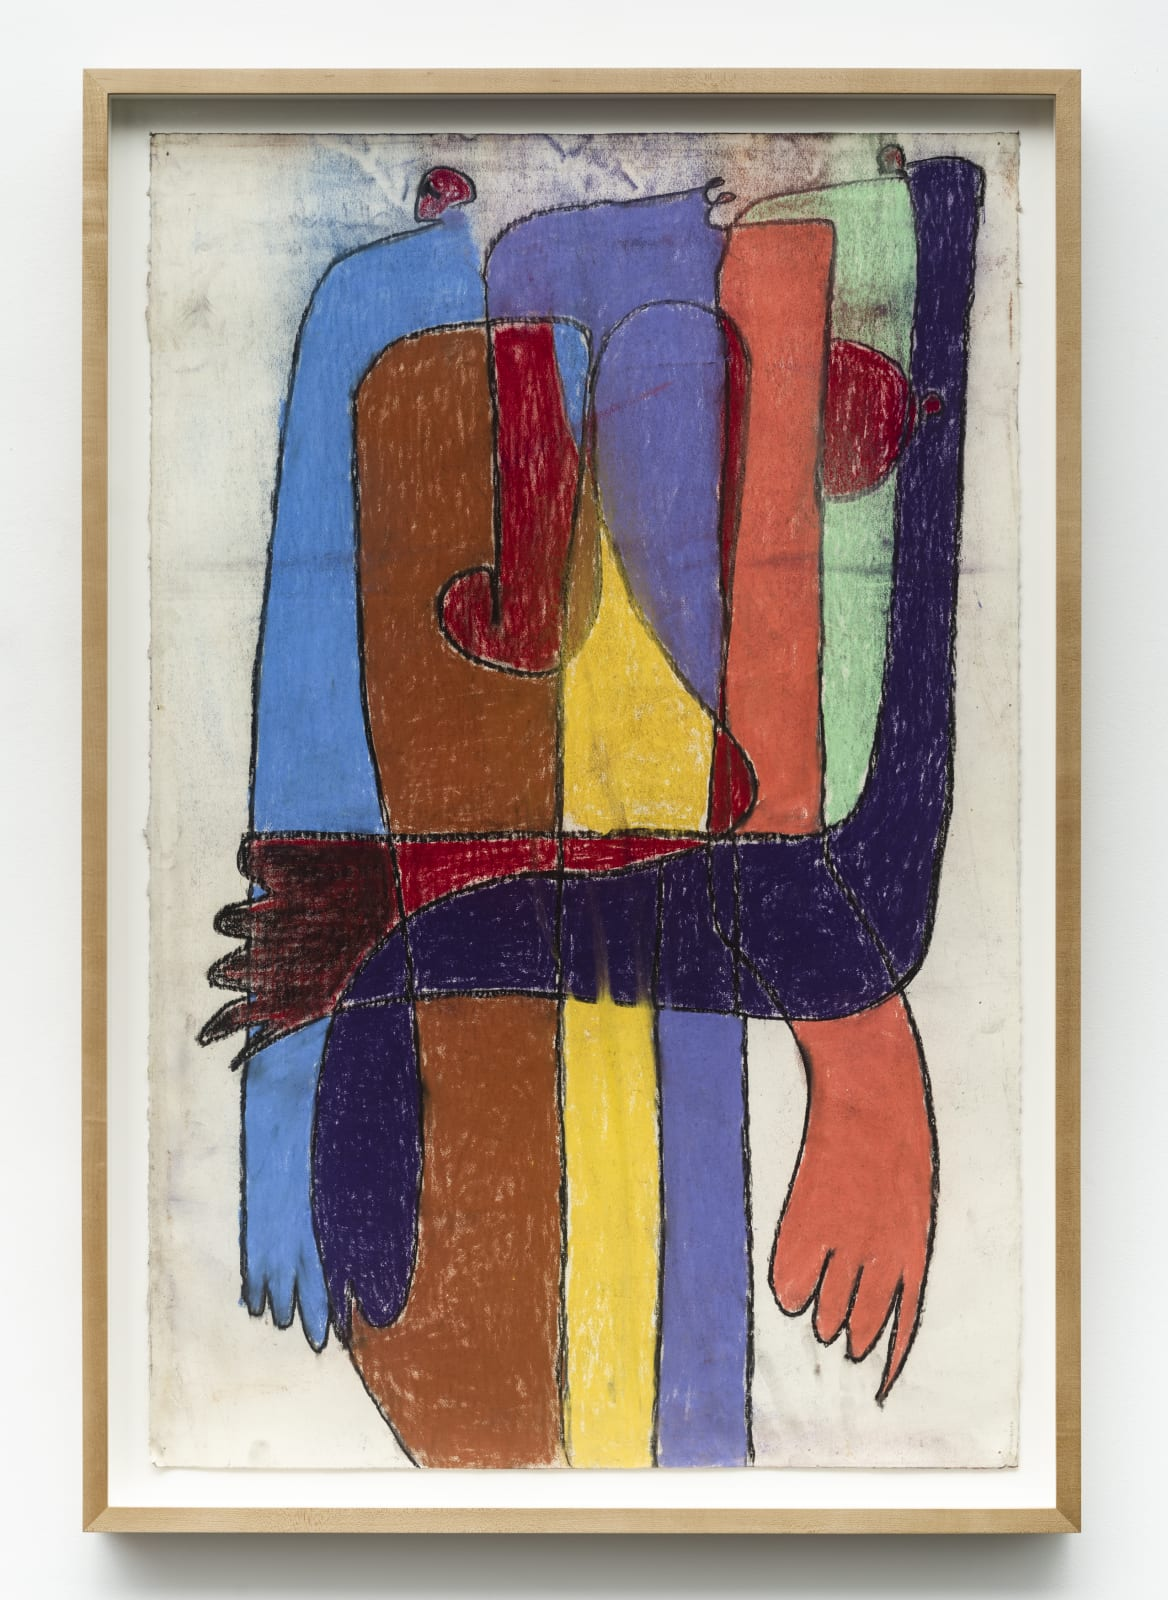 Serge Attukwei Clottey, Hug someone, 2018